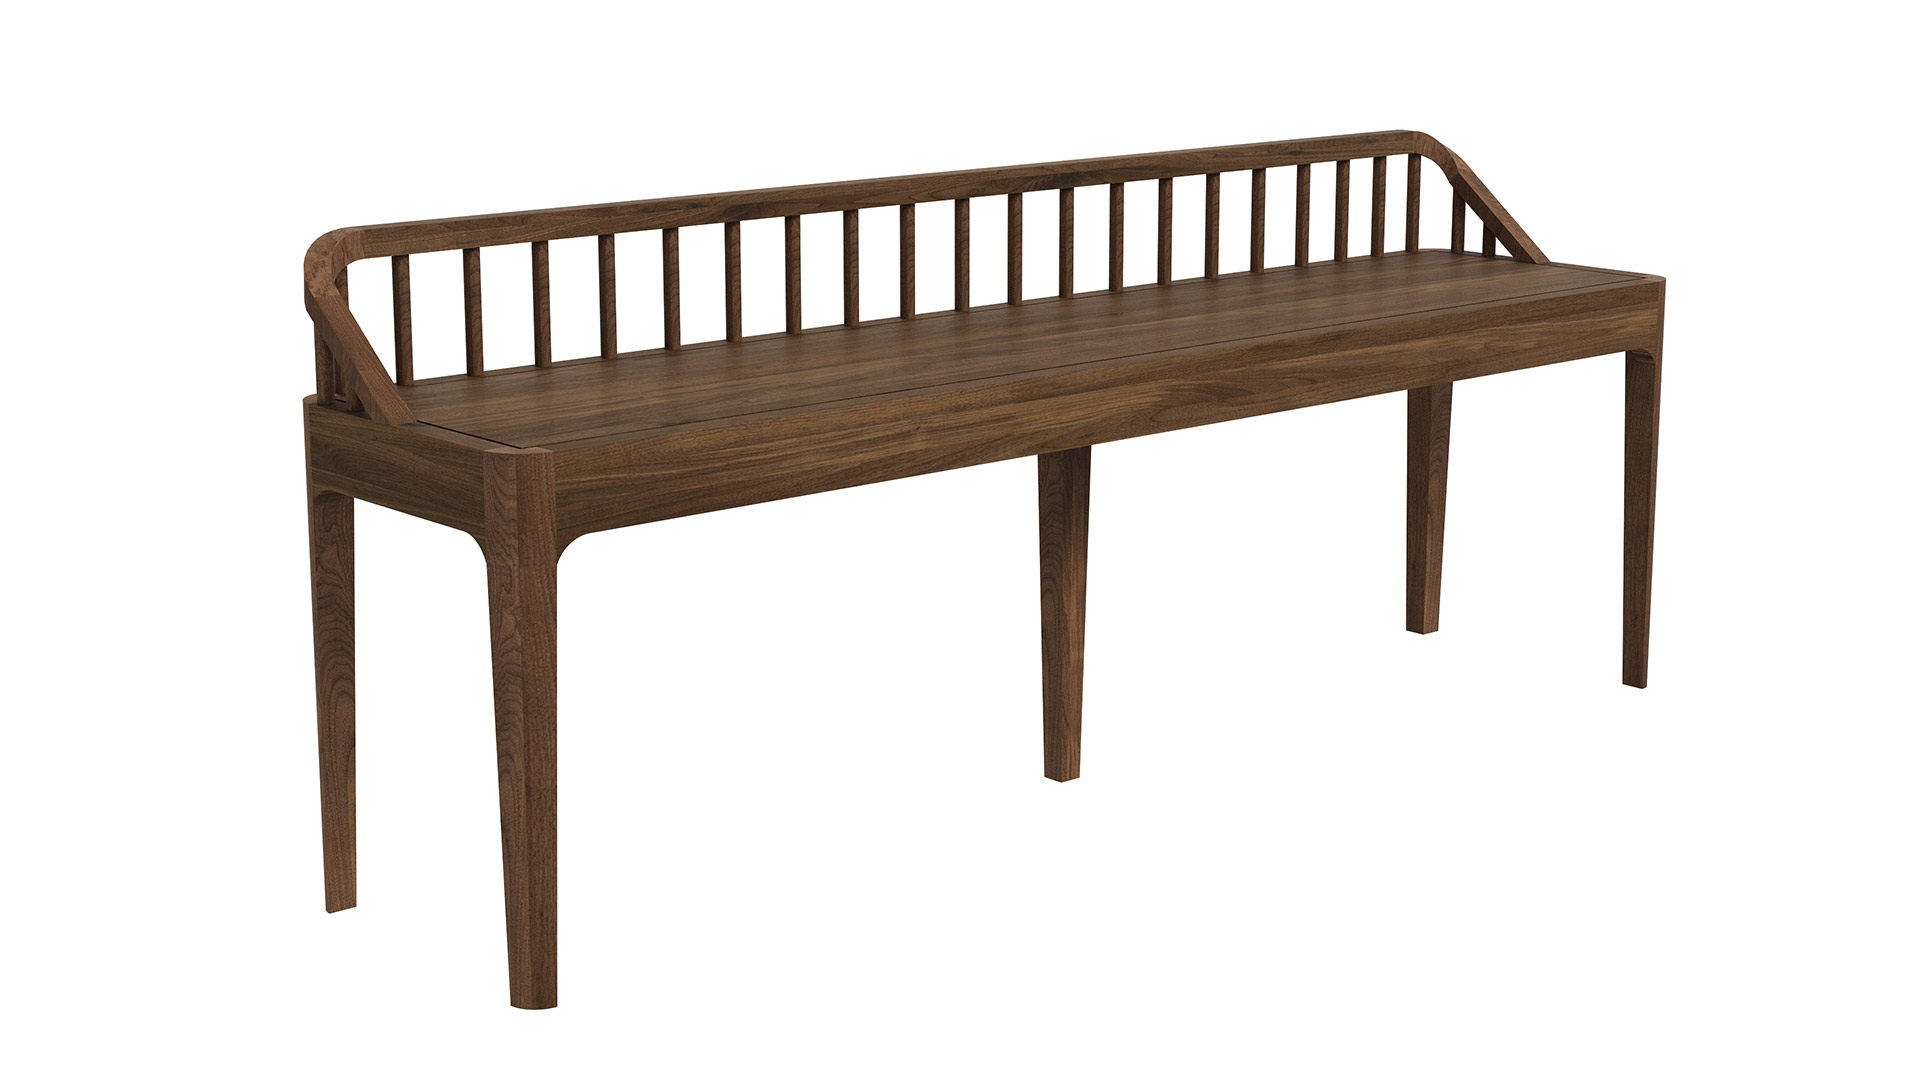 Ethnicraft-Spindle-bench-Walnut